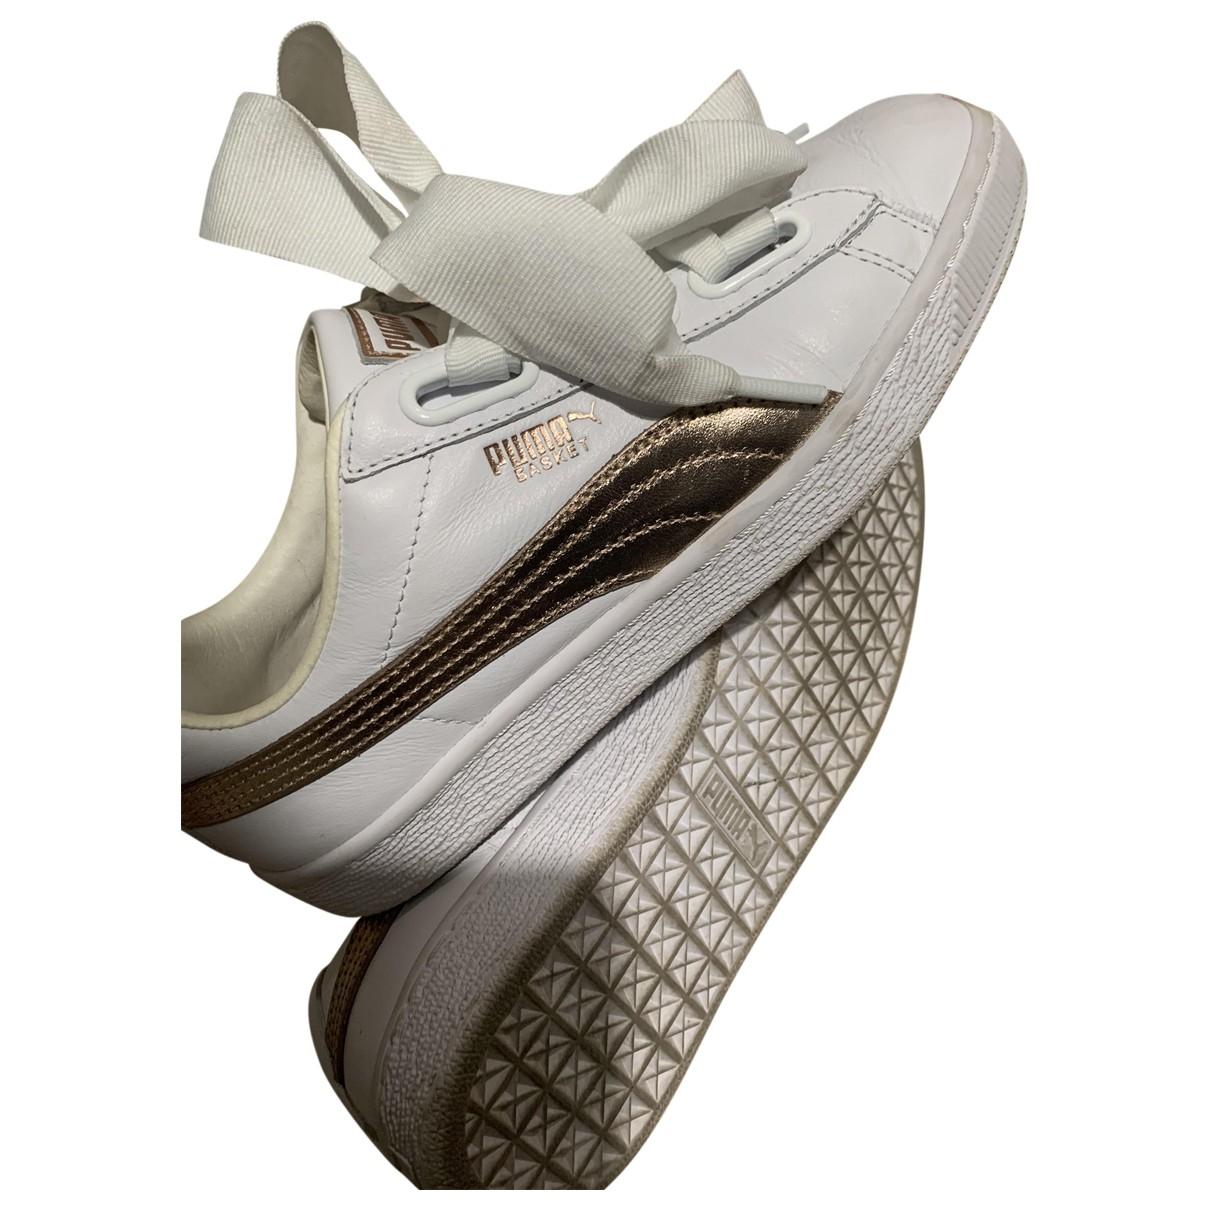 Fenty X Puma \N White Leather Trainers for Women 38 EU